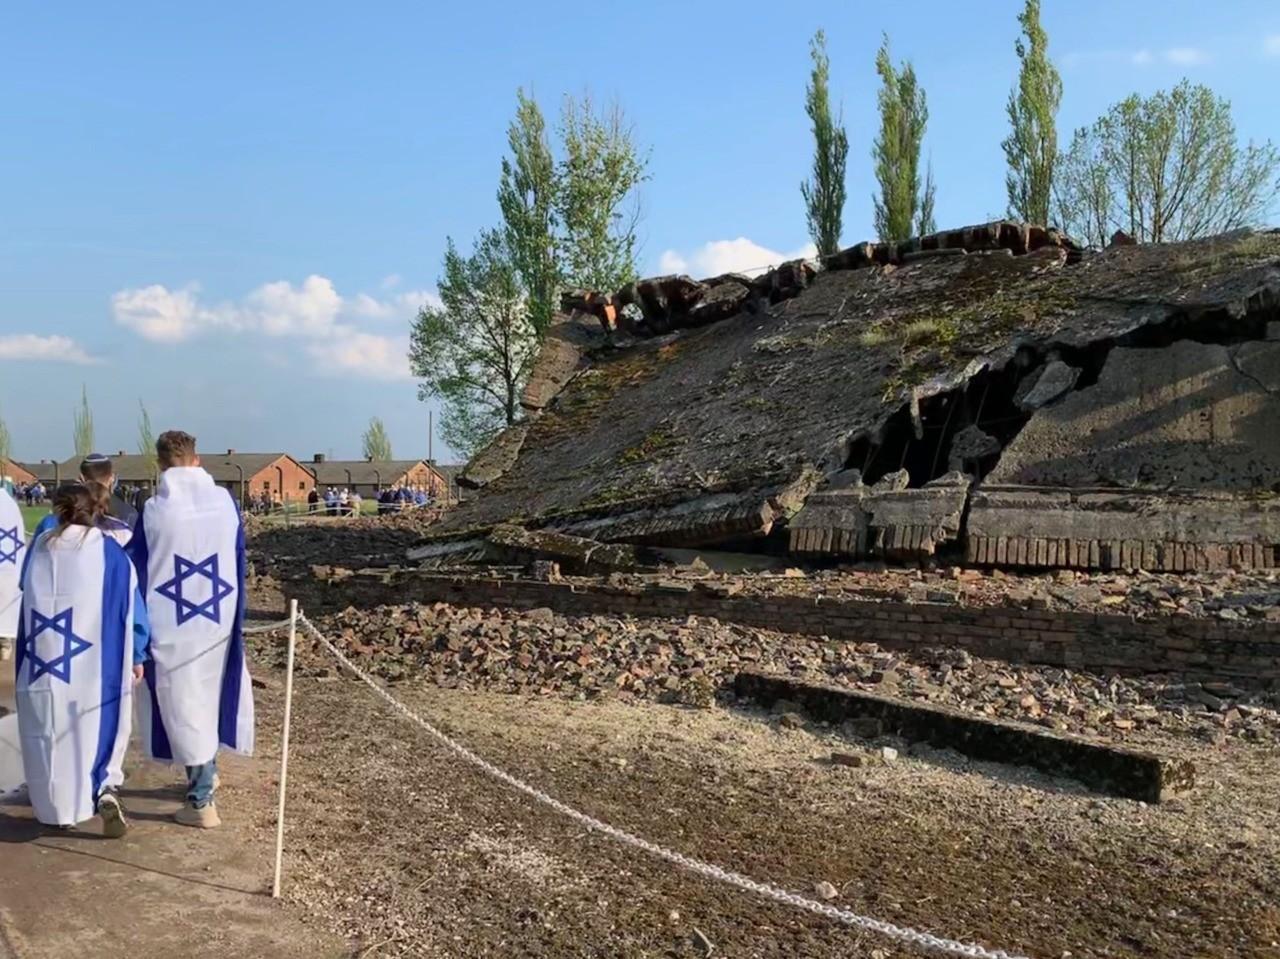 Participants walk by the ruins of a crematorium at Birkenau